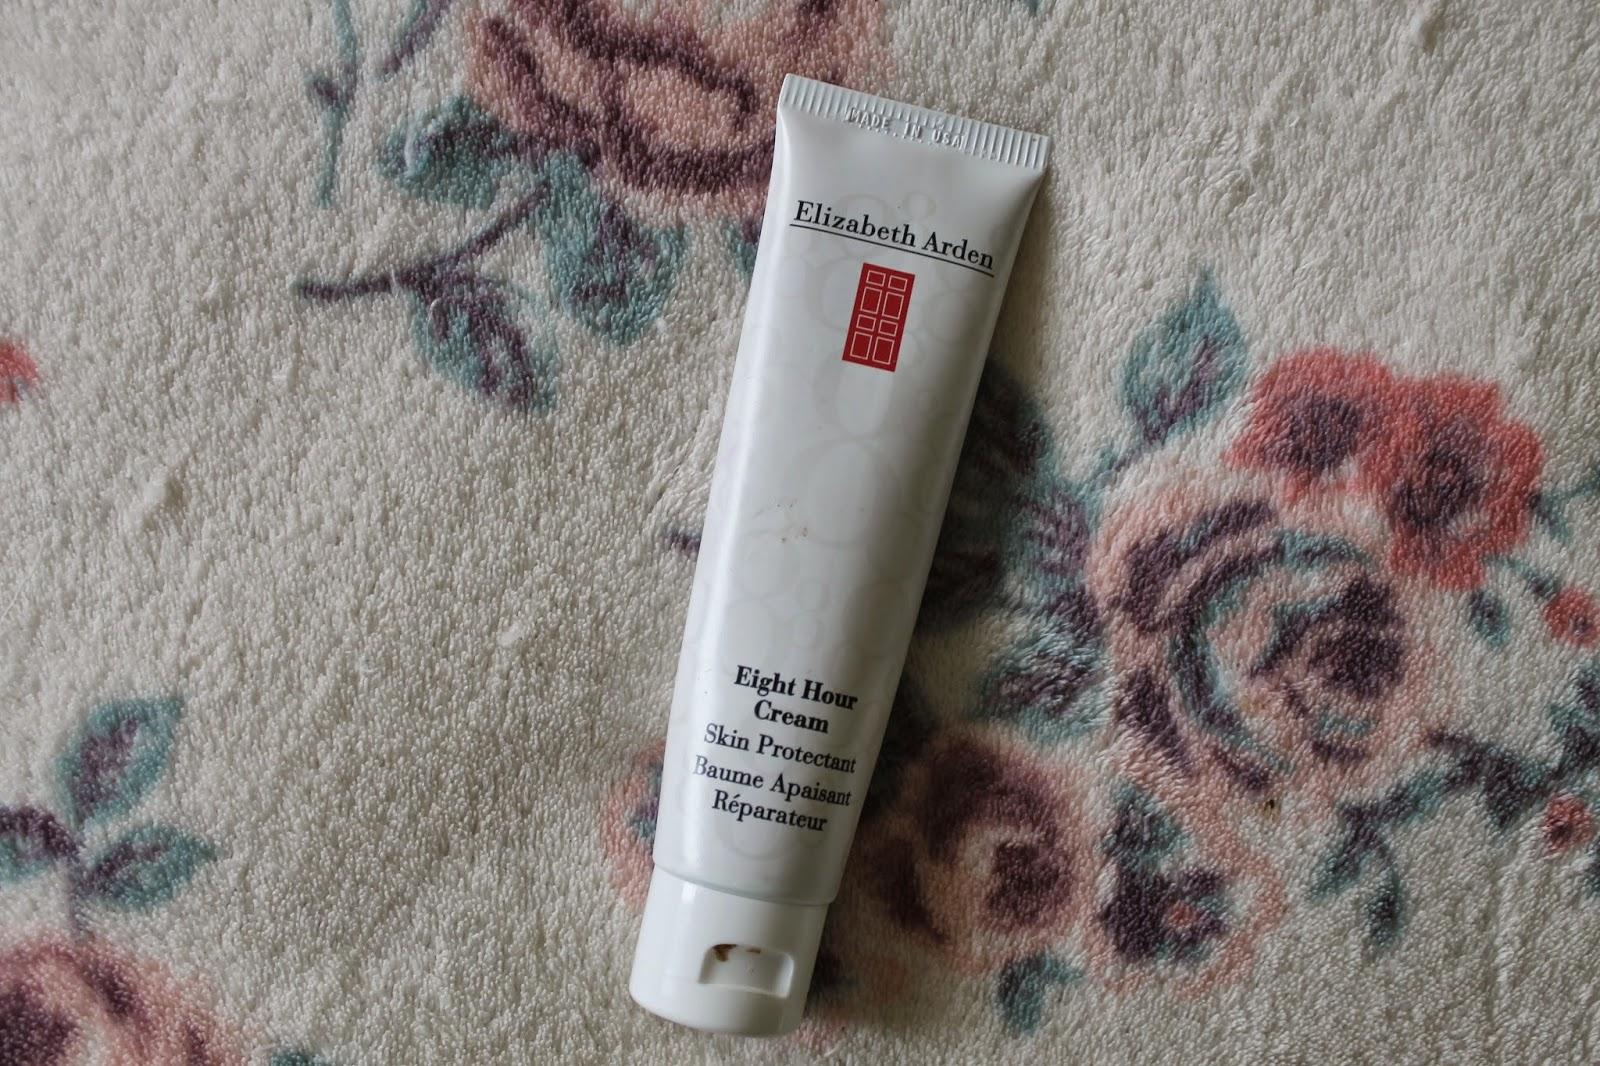 Top 5 Lip Balms Elizabeth Arden 8 Hour Cream